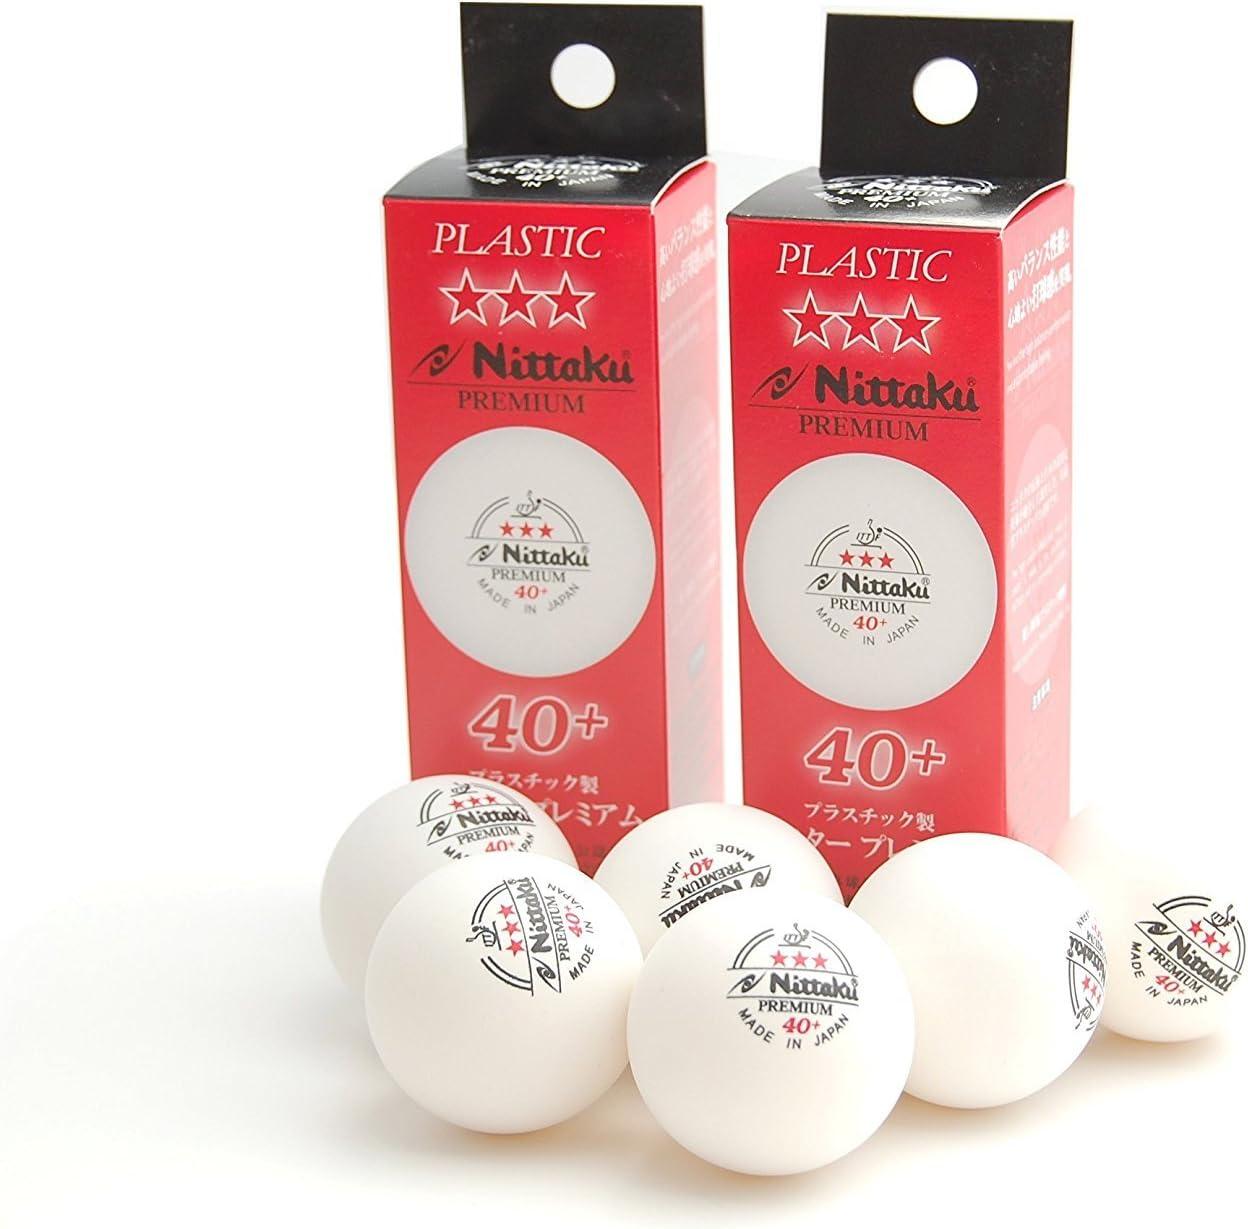 Nittaku 3-Star Premium 40+ - Pelotas de tenis de mesa, 6 bolas